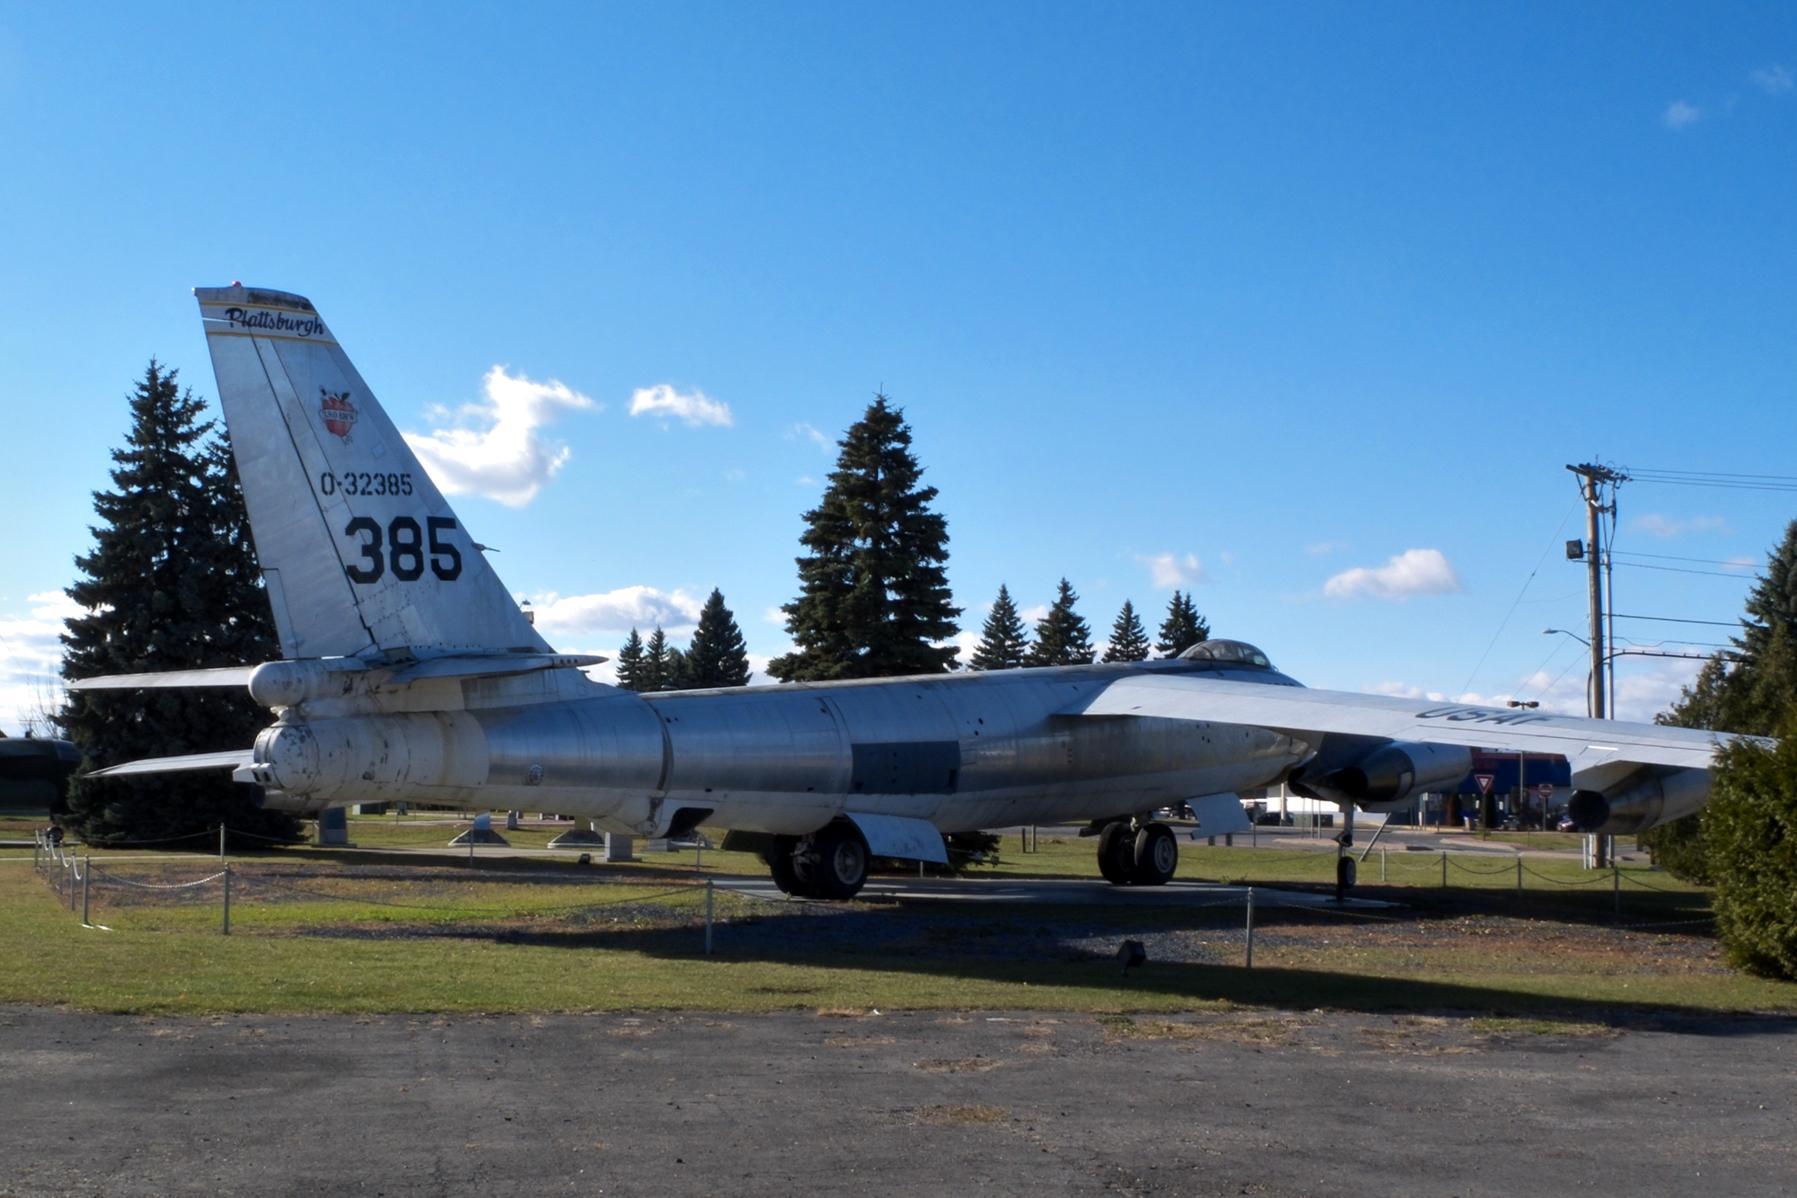 Old Plattsburgh Air Force Base